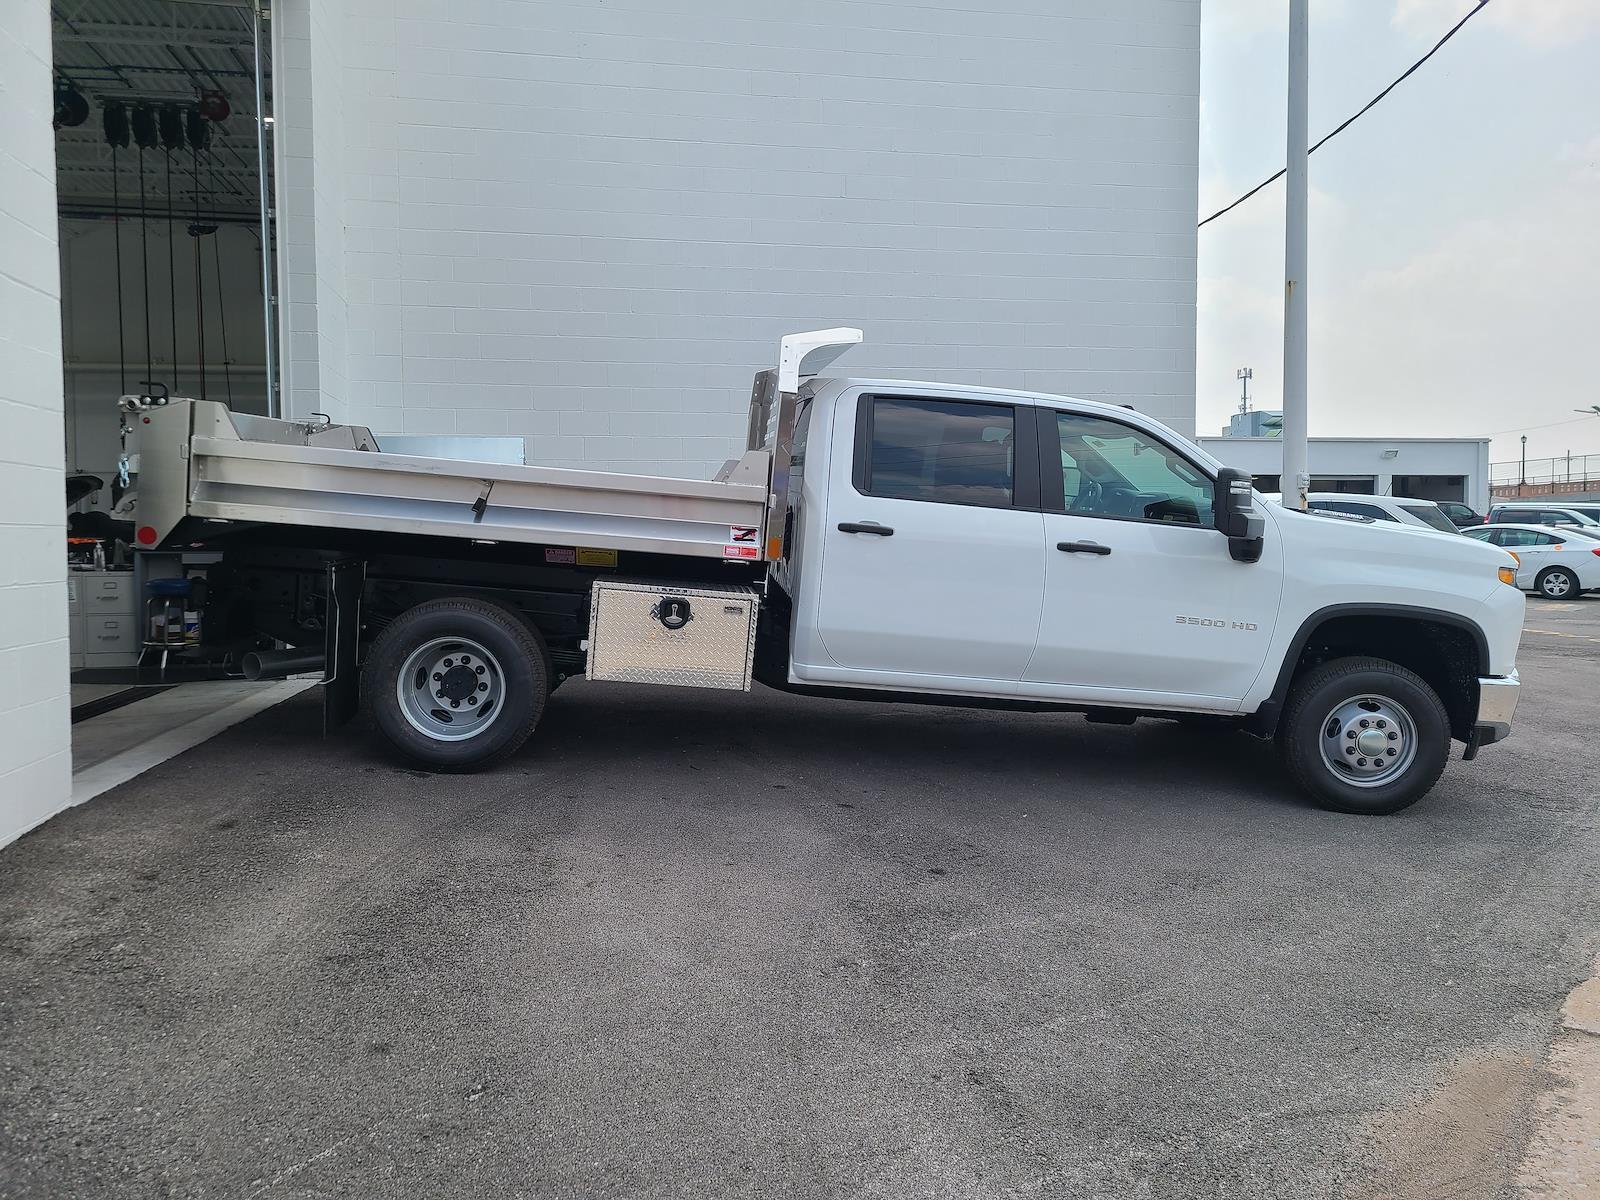 2021 Silverado 3500 Crew Cab 4x4,  Monroe Truck Equipment MTE-Zee SST Series Dump Body #C210451 - photo 3